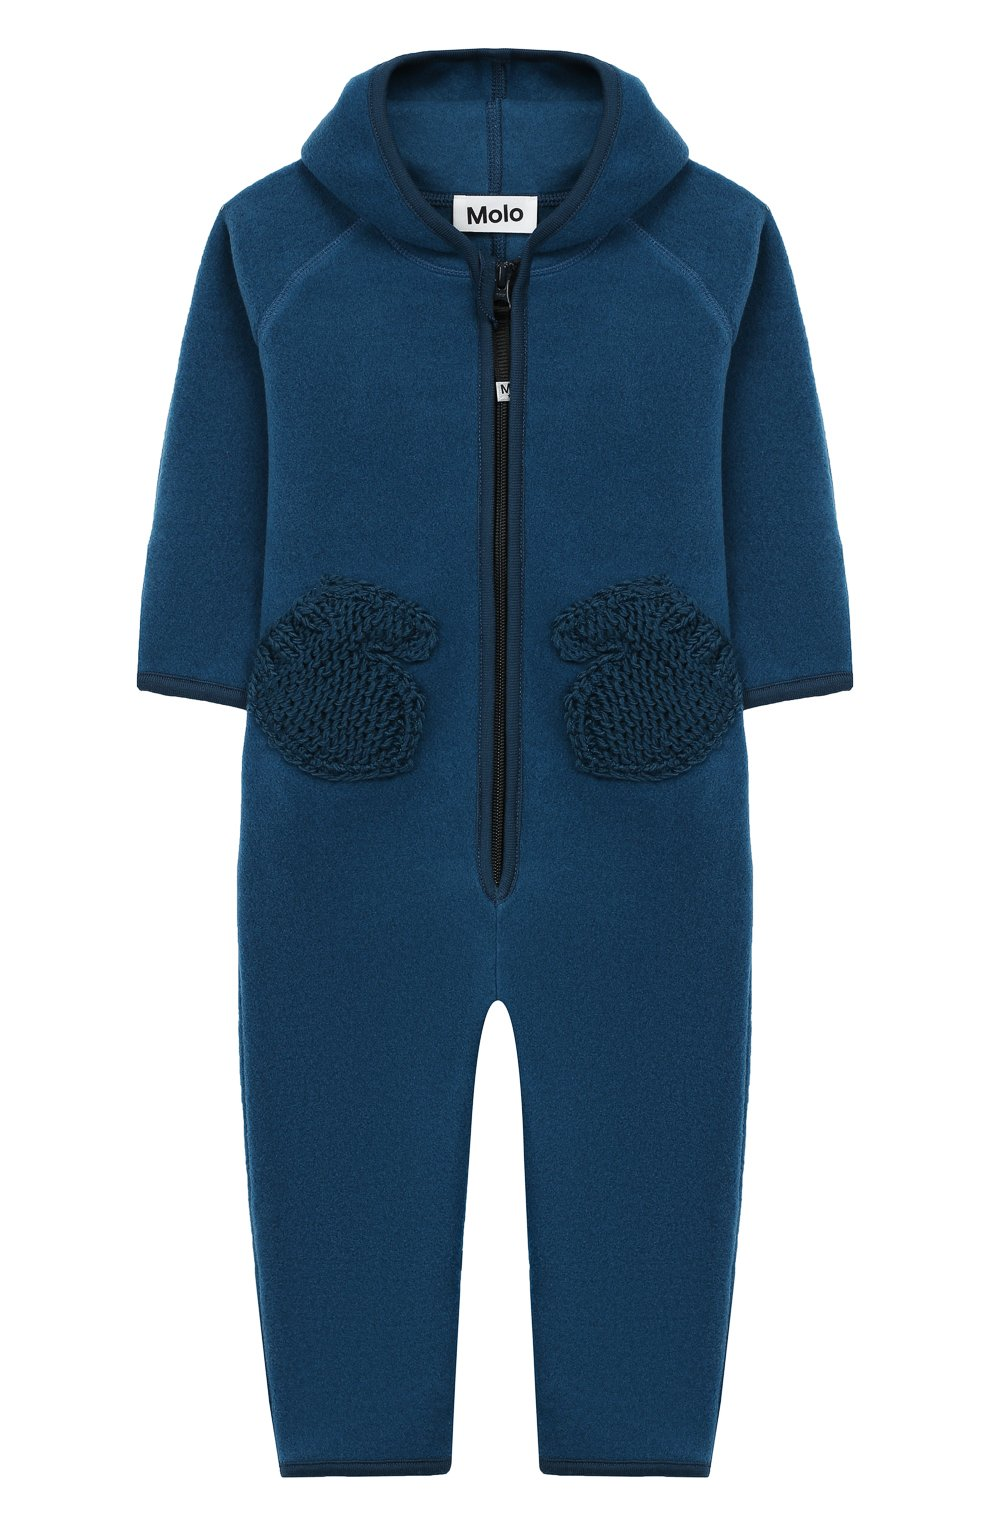 Детский комбинезон MOLO синего цвета, арт. 5W19L302 | Фото 1